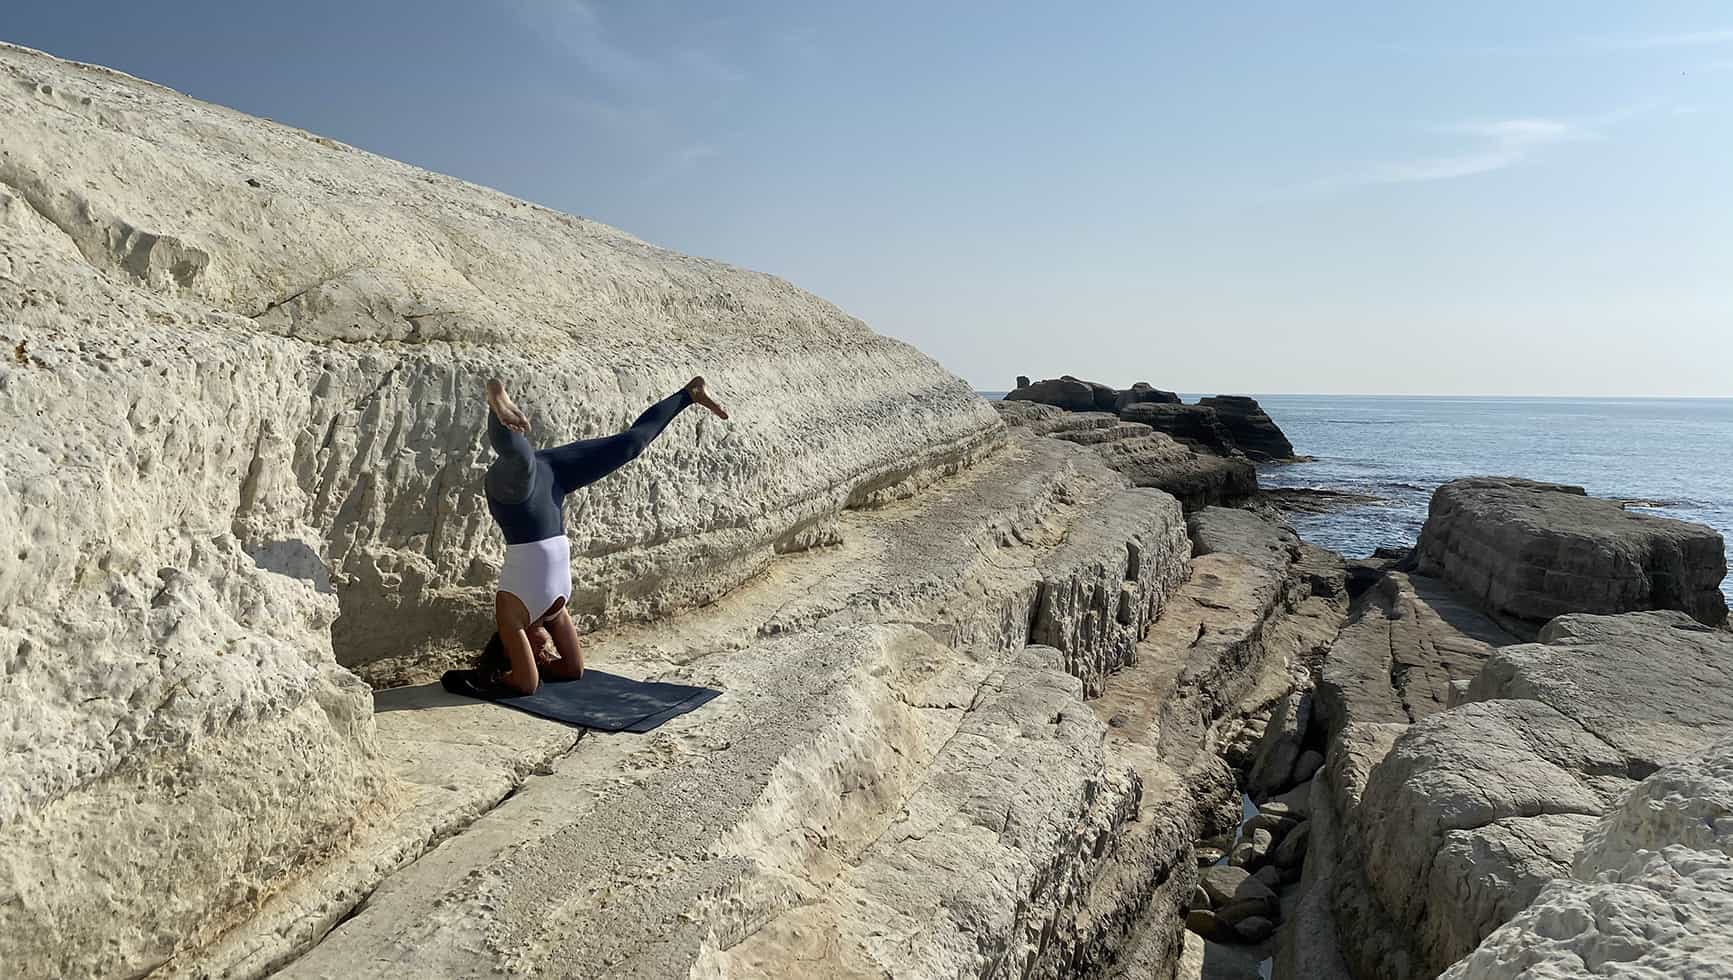 Inverted Yoga Pose